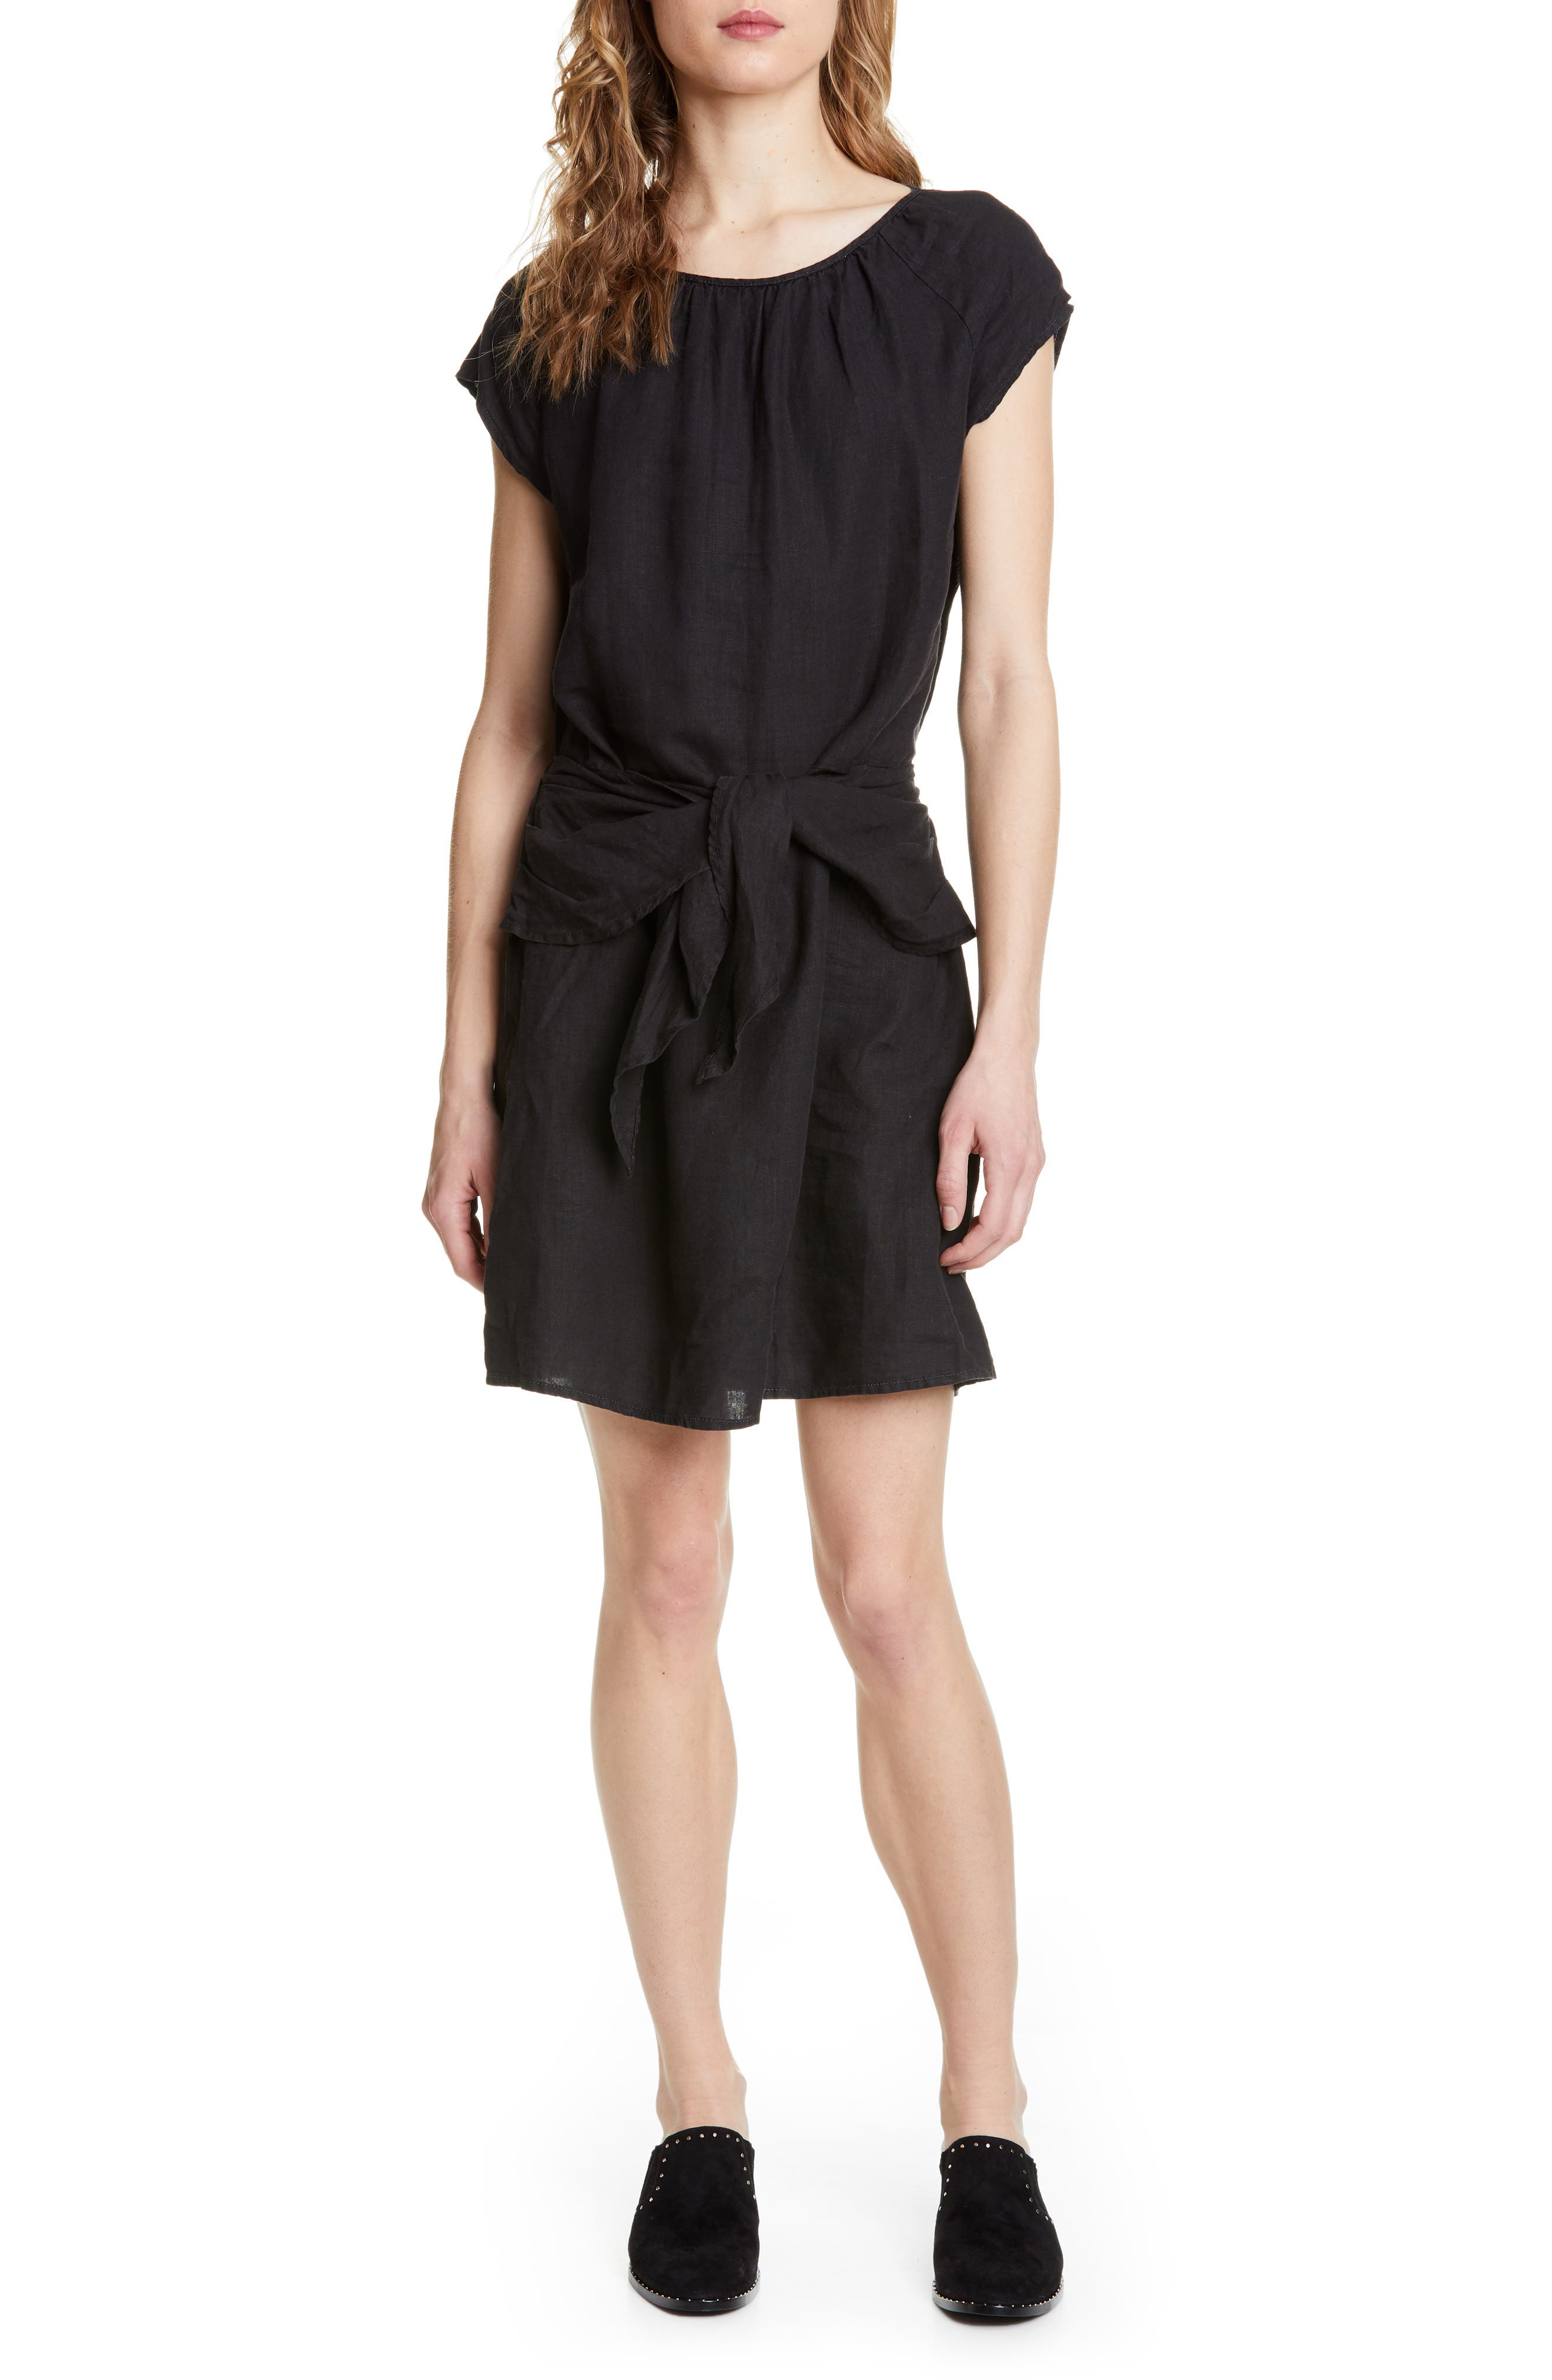 Joie Adoette Linen Minidress, Black